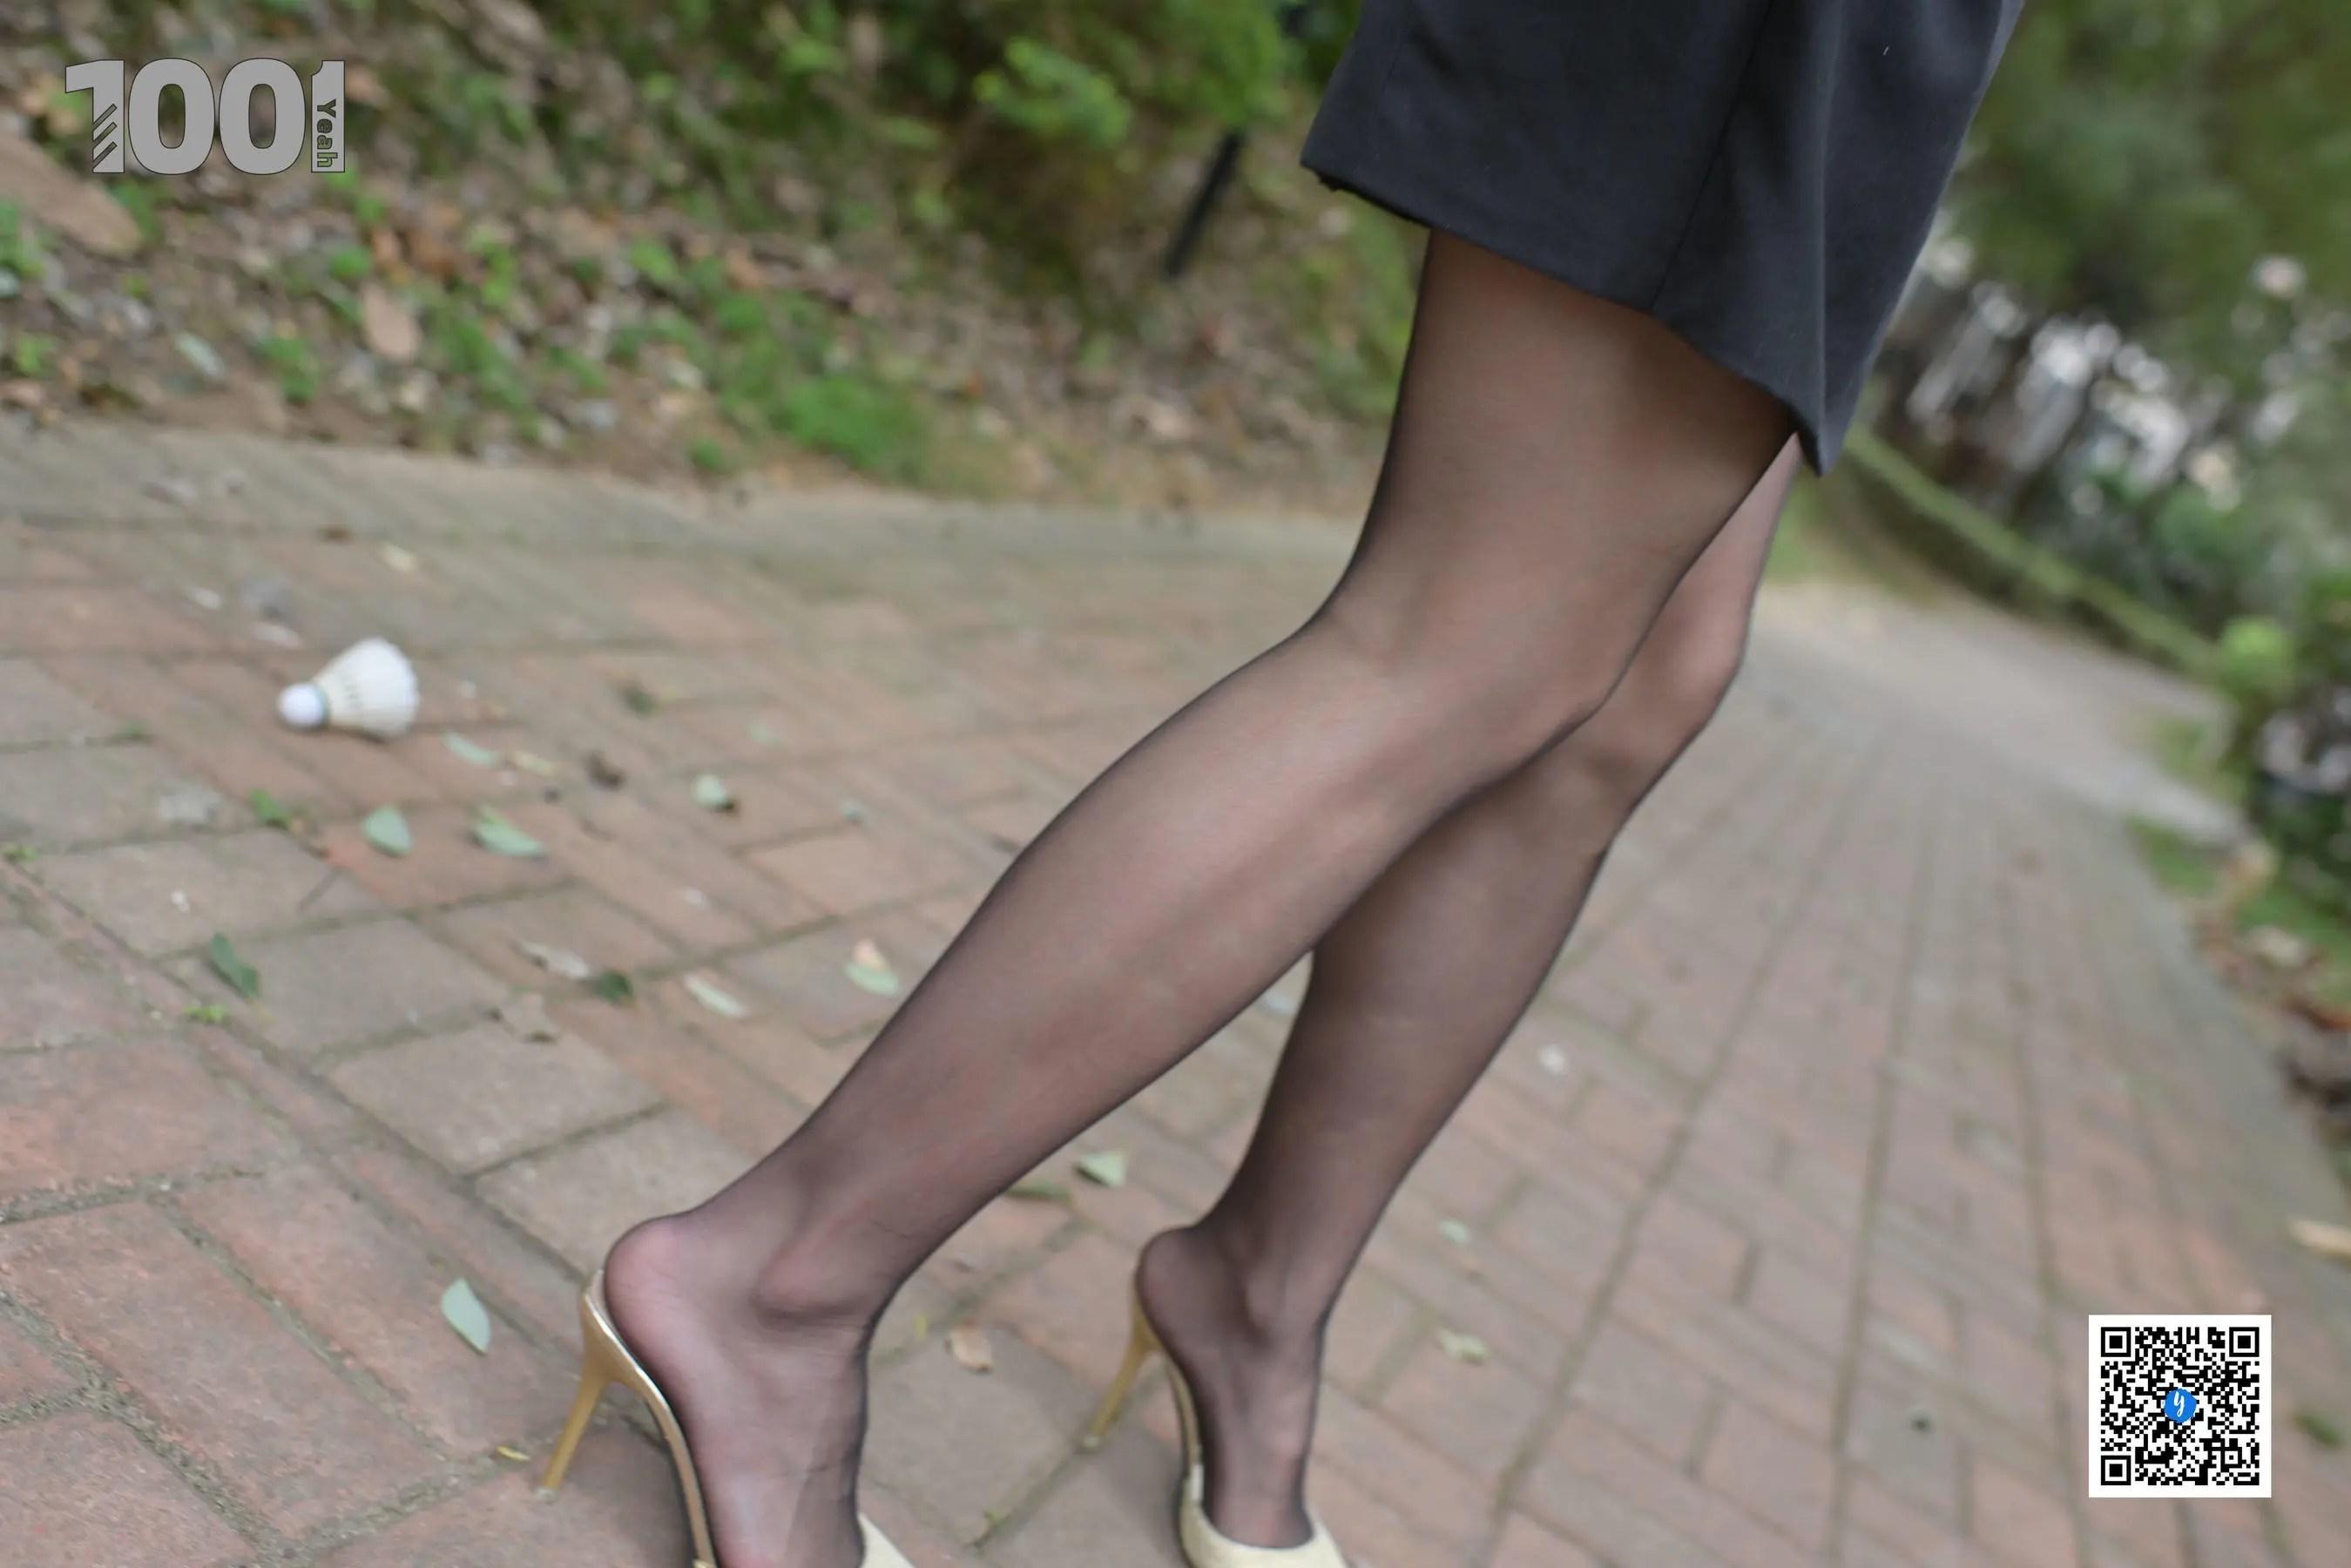 [IESS] NO.191 真真 【打羽毛球1】  丝袜美腿写真[80P]插图(8)